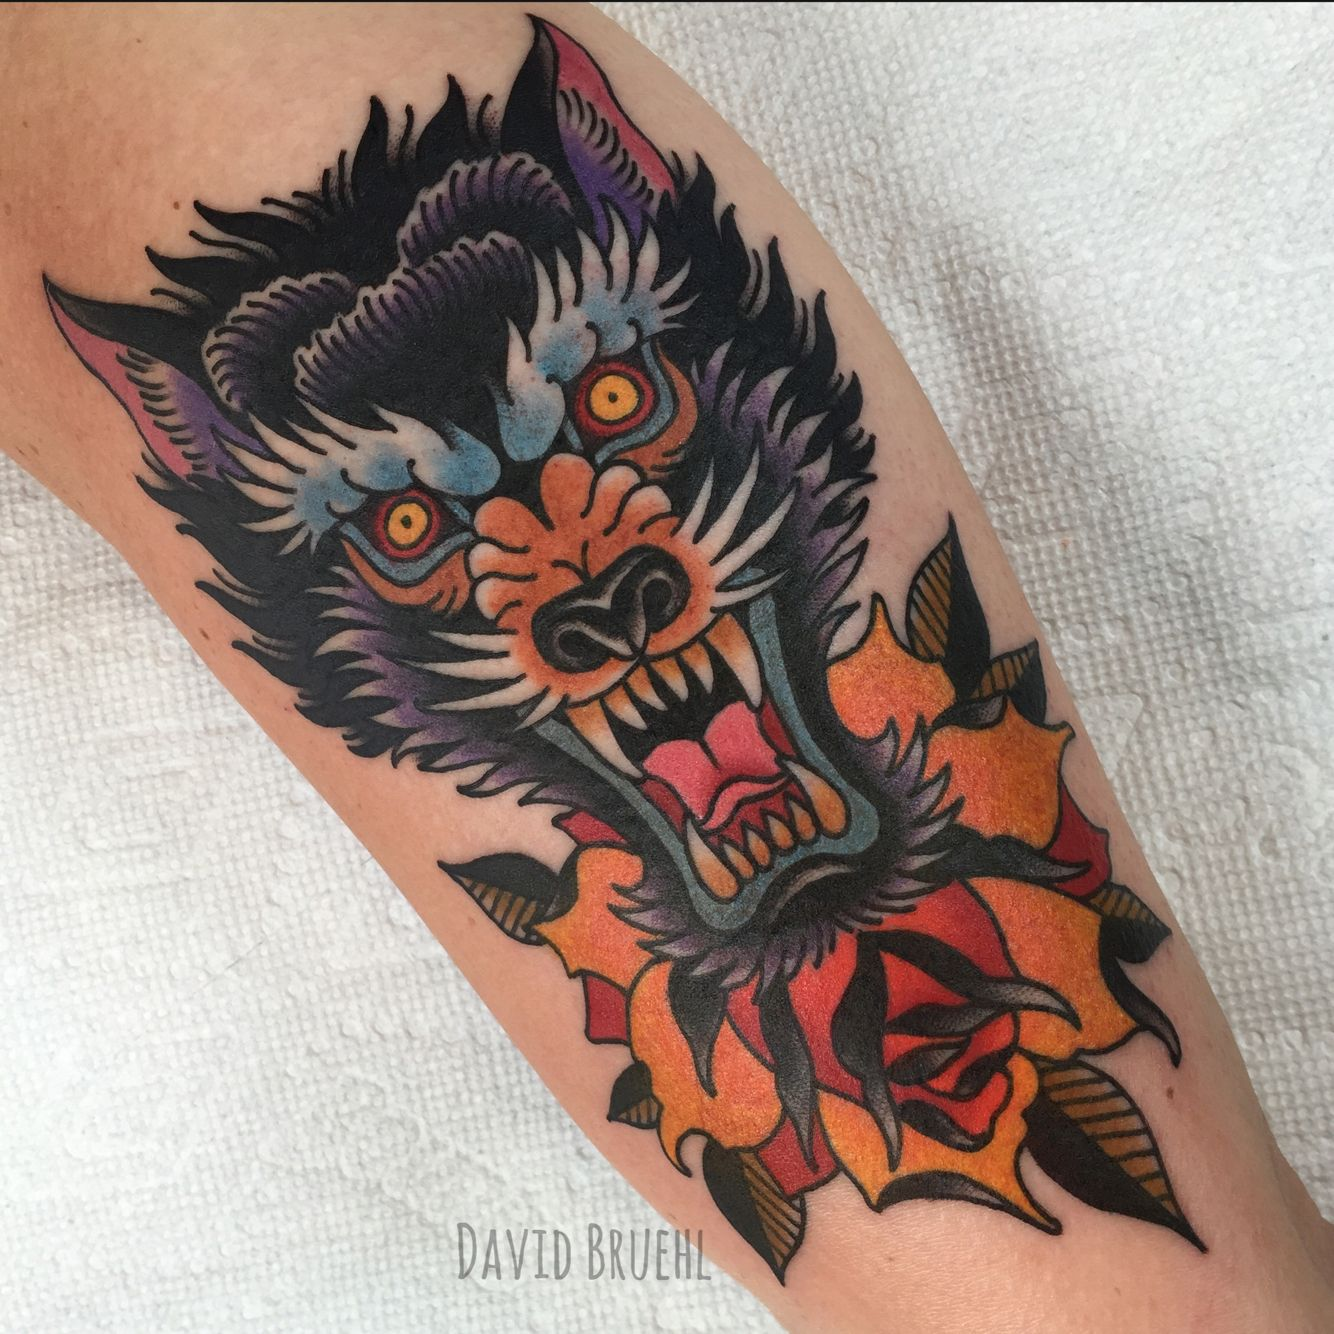 87ac83c51deb8 Bright wild fierce symmetrical wolf head and rose on upper inner arm.  Traditional color tattoo. David Bruehl RedLetter1 Tampa,FL  www.davidbruehl.com